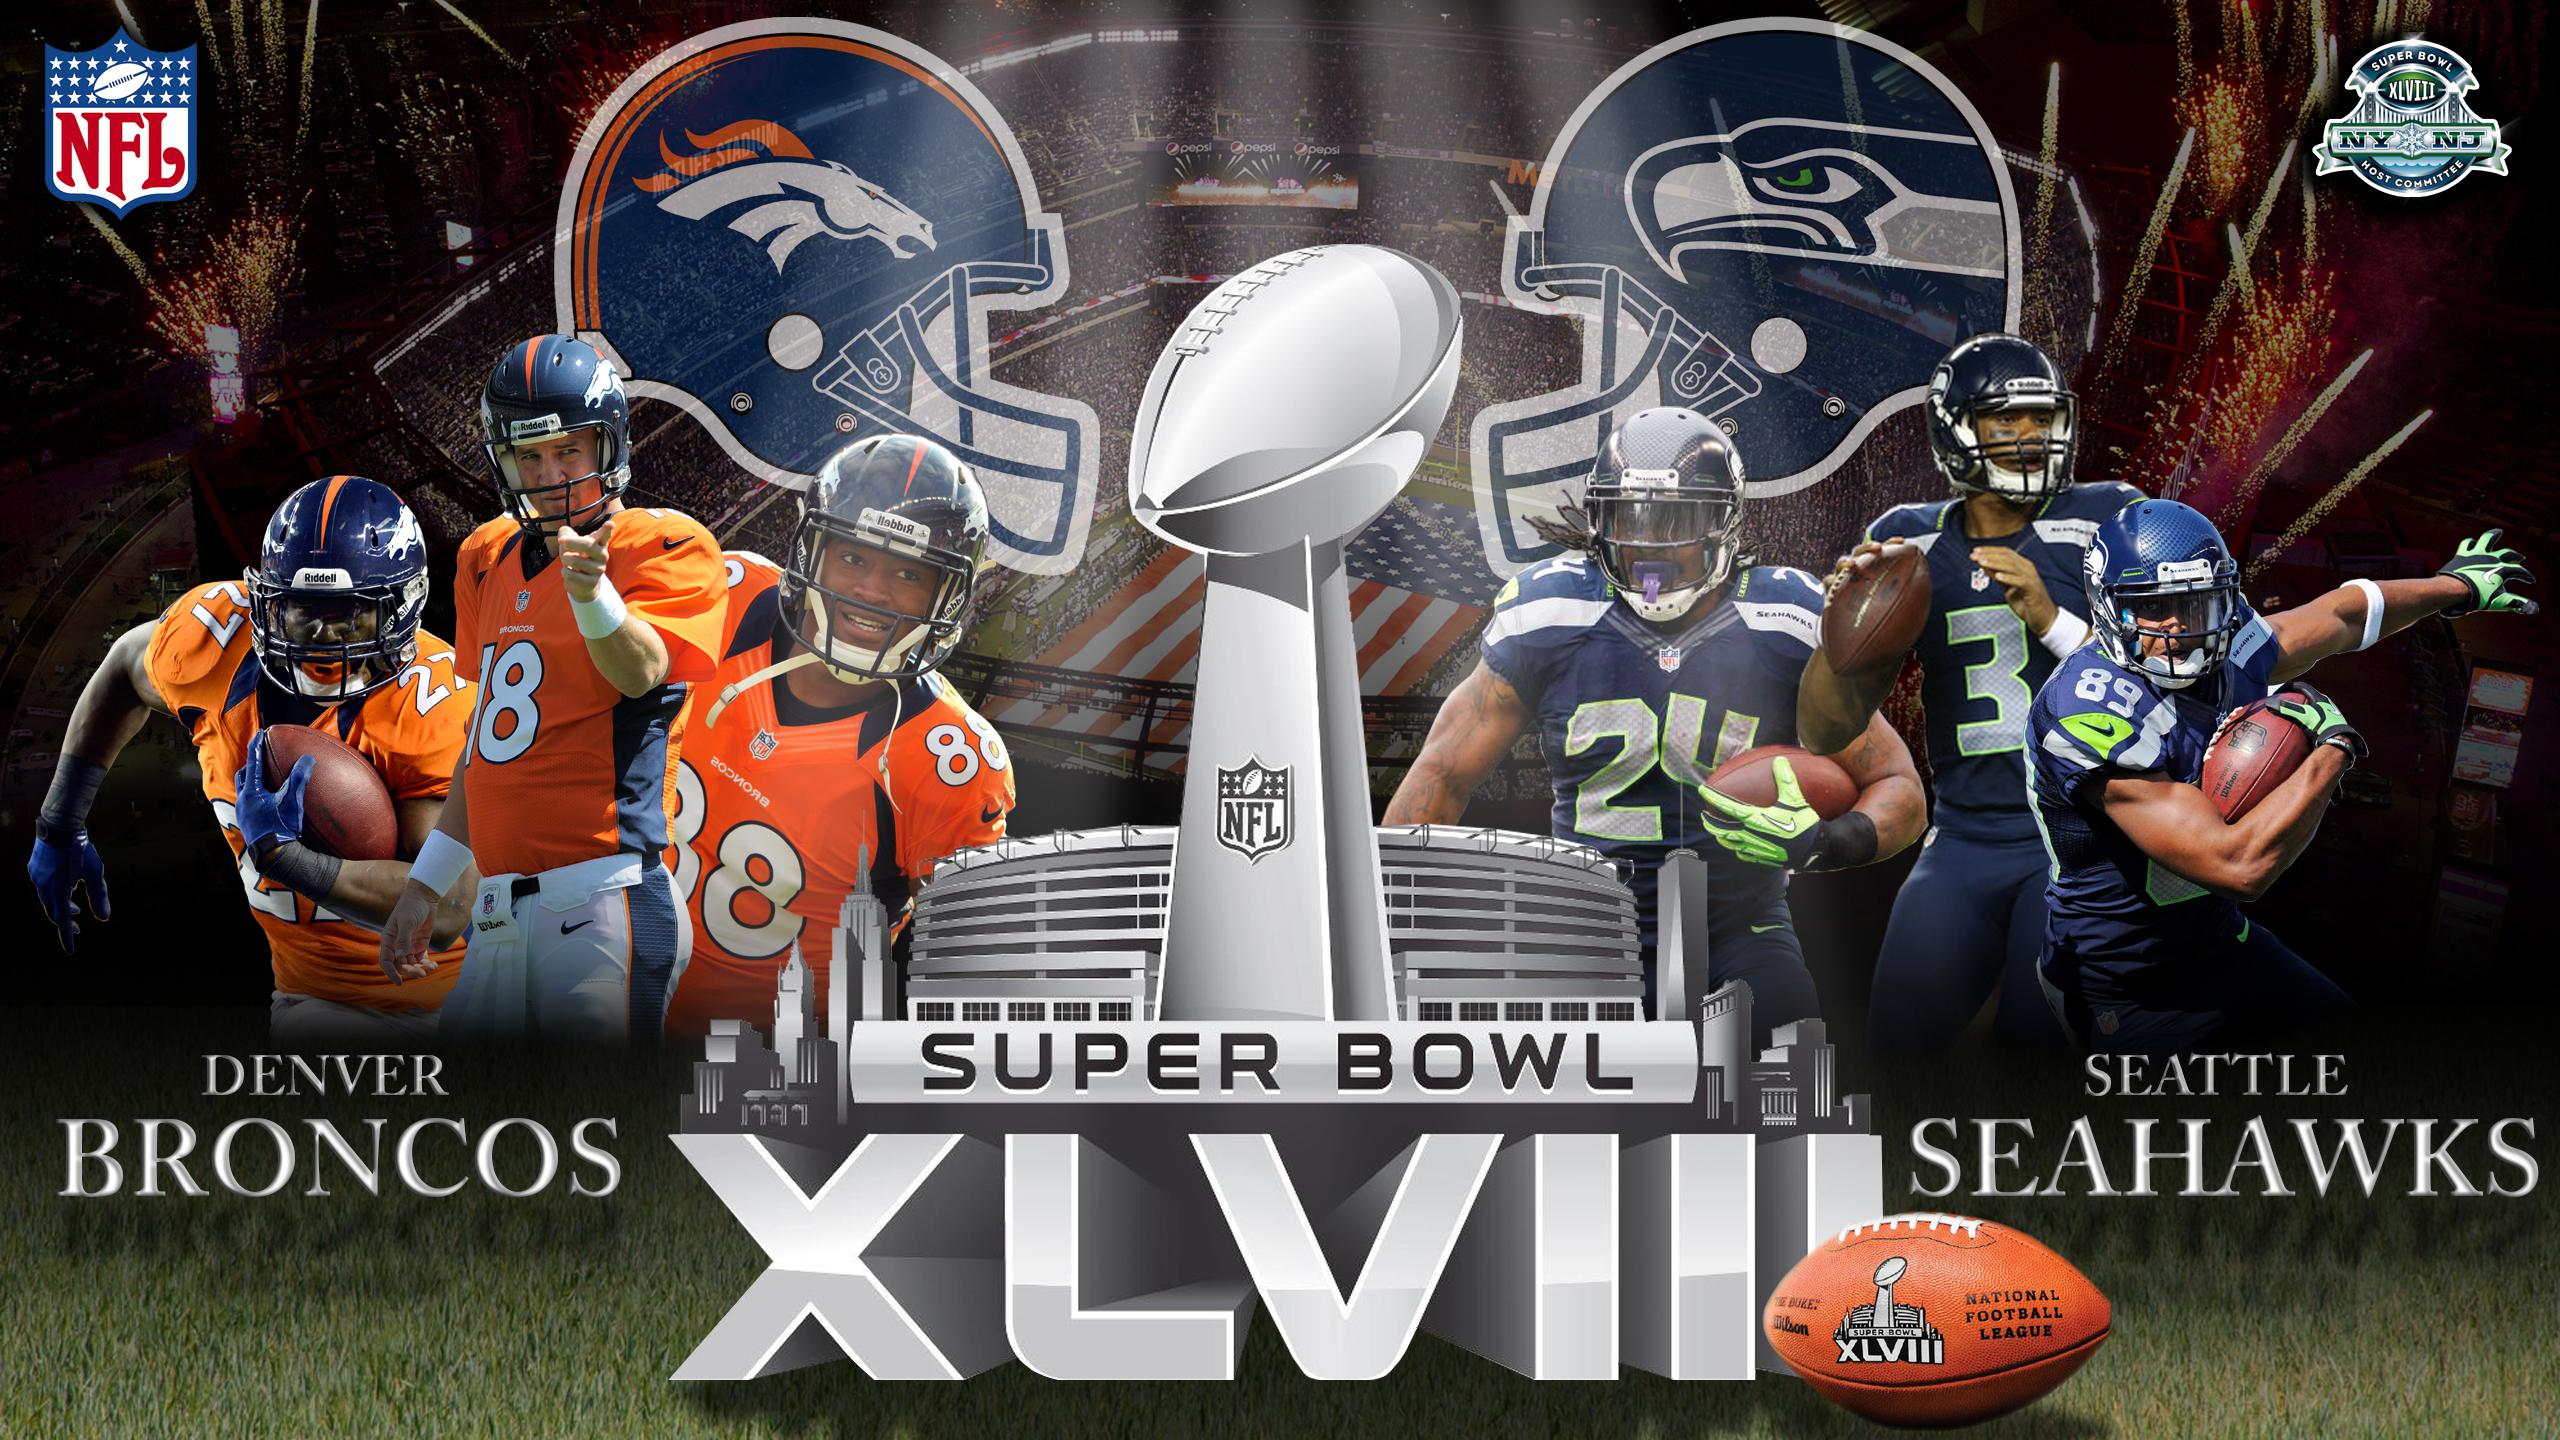 Super Bowl XLVIII Broncos Vs Seahawks by BeAware8 2560x1440